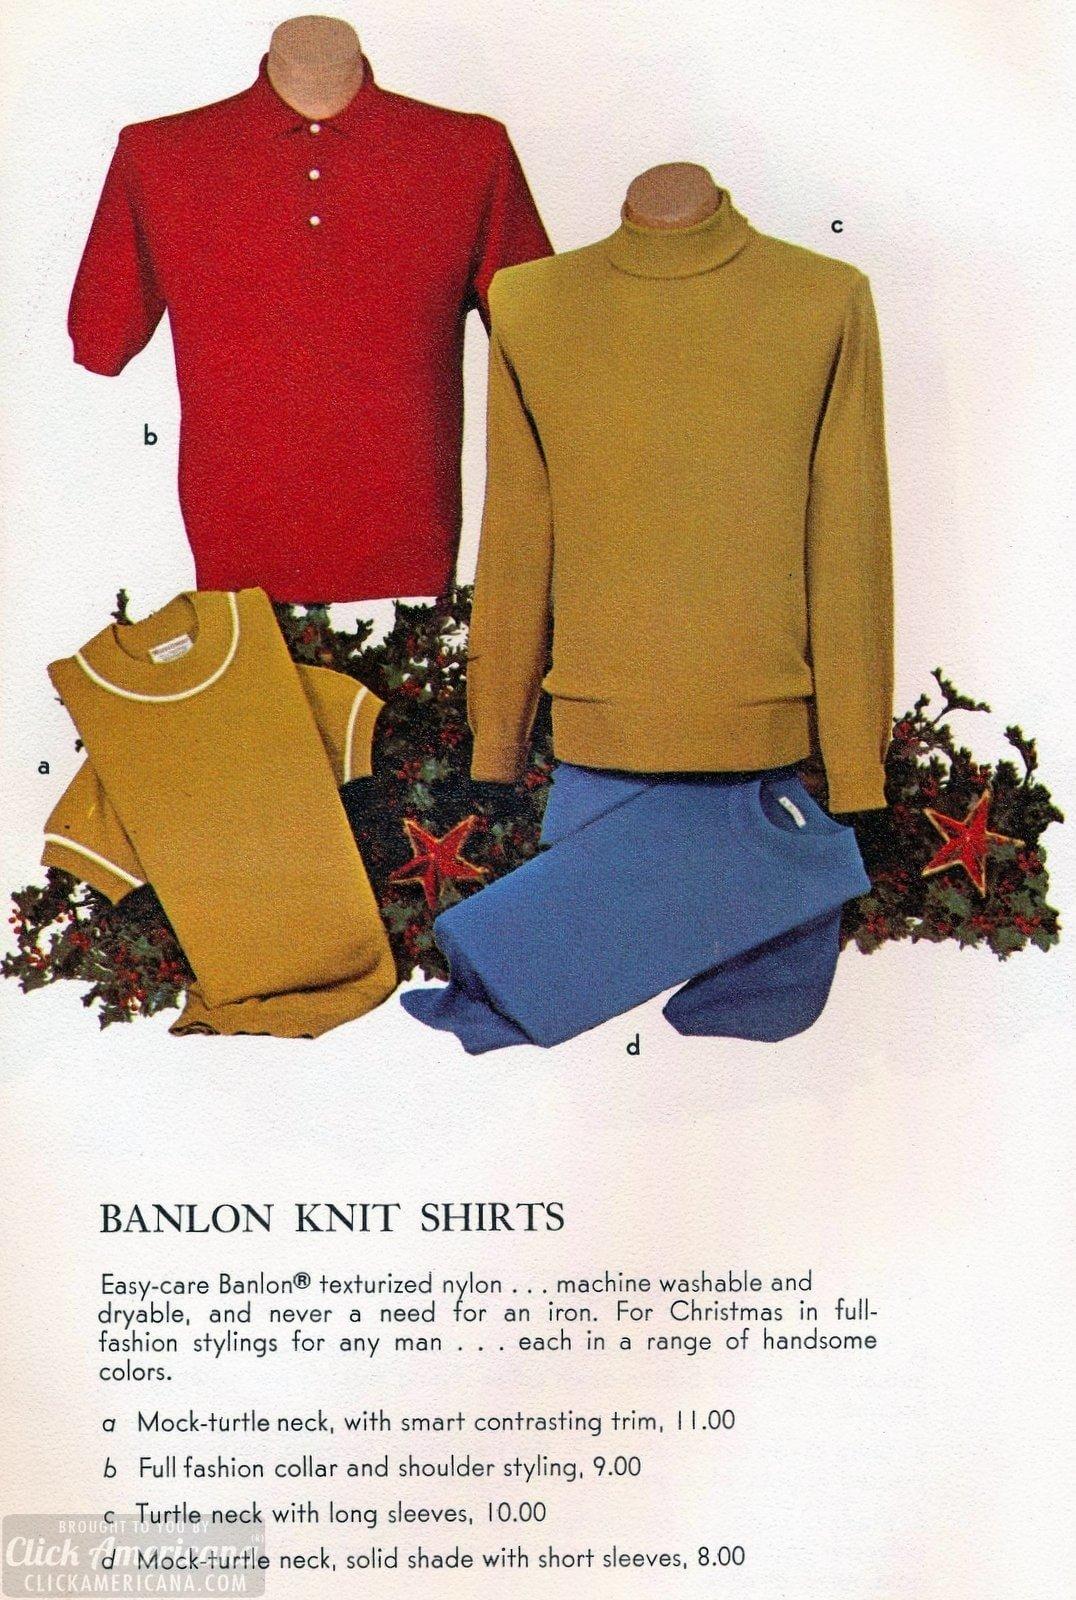 Vintage Banlon nylon casual knit shirts for men